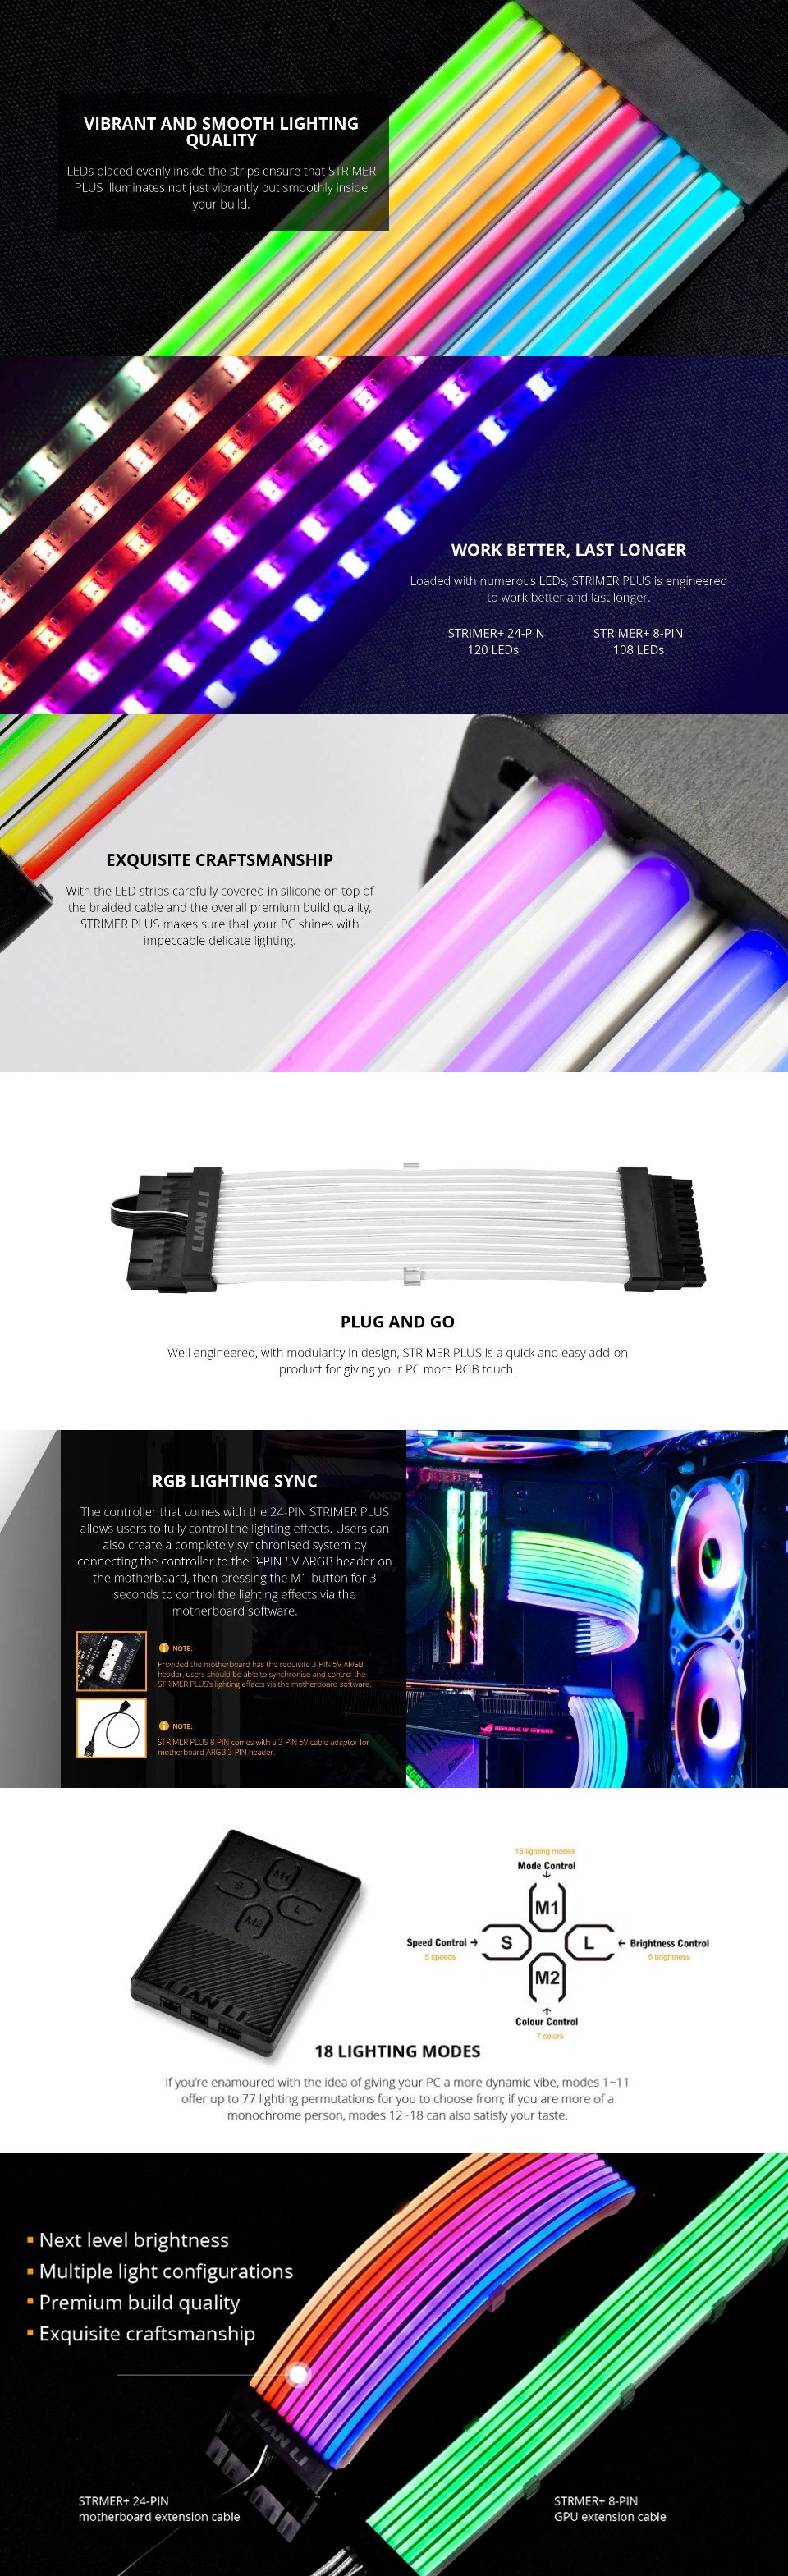 Lian Li Strimer+ ARGB 24 Pin Extension Cable features 2